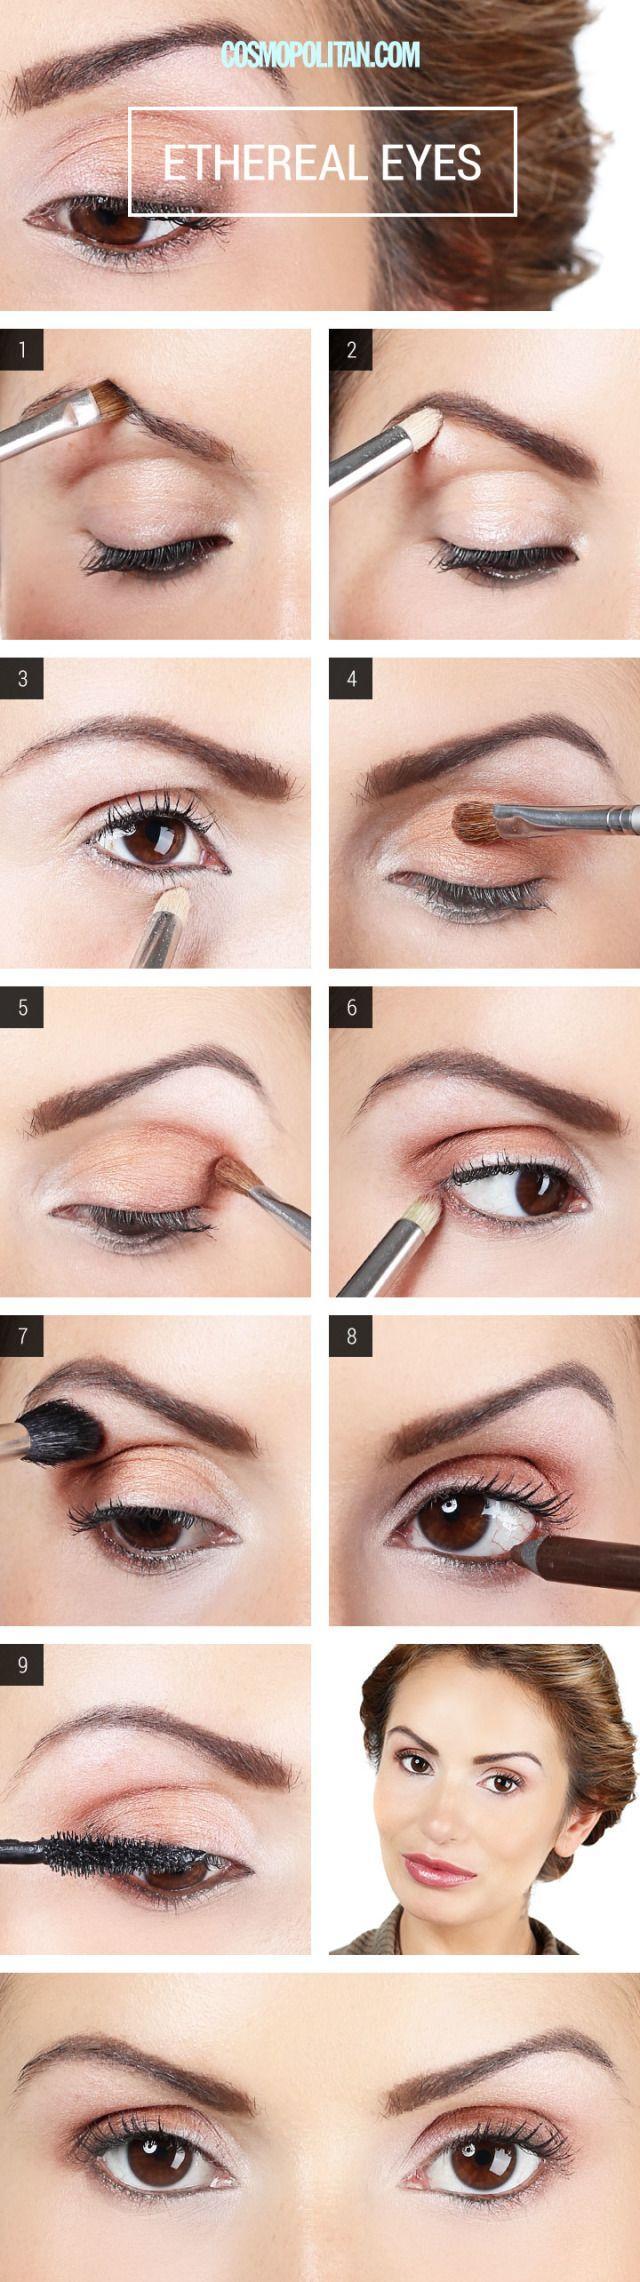 Wedding - Makeup How-To: Ethereal Eyes